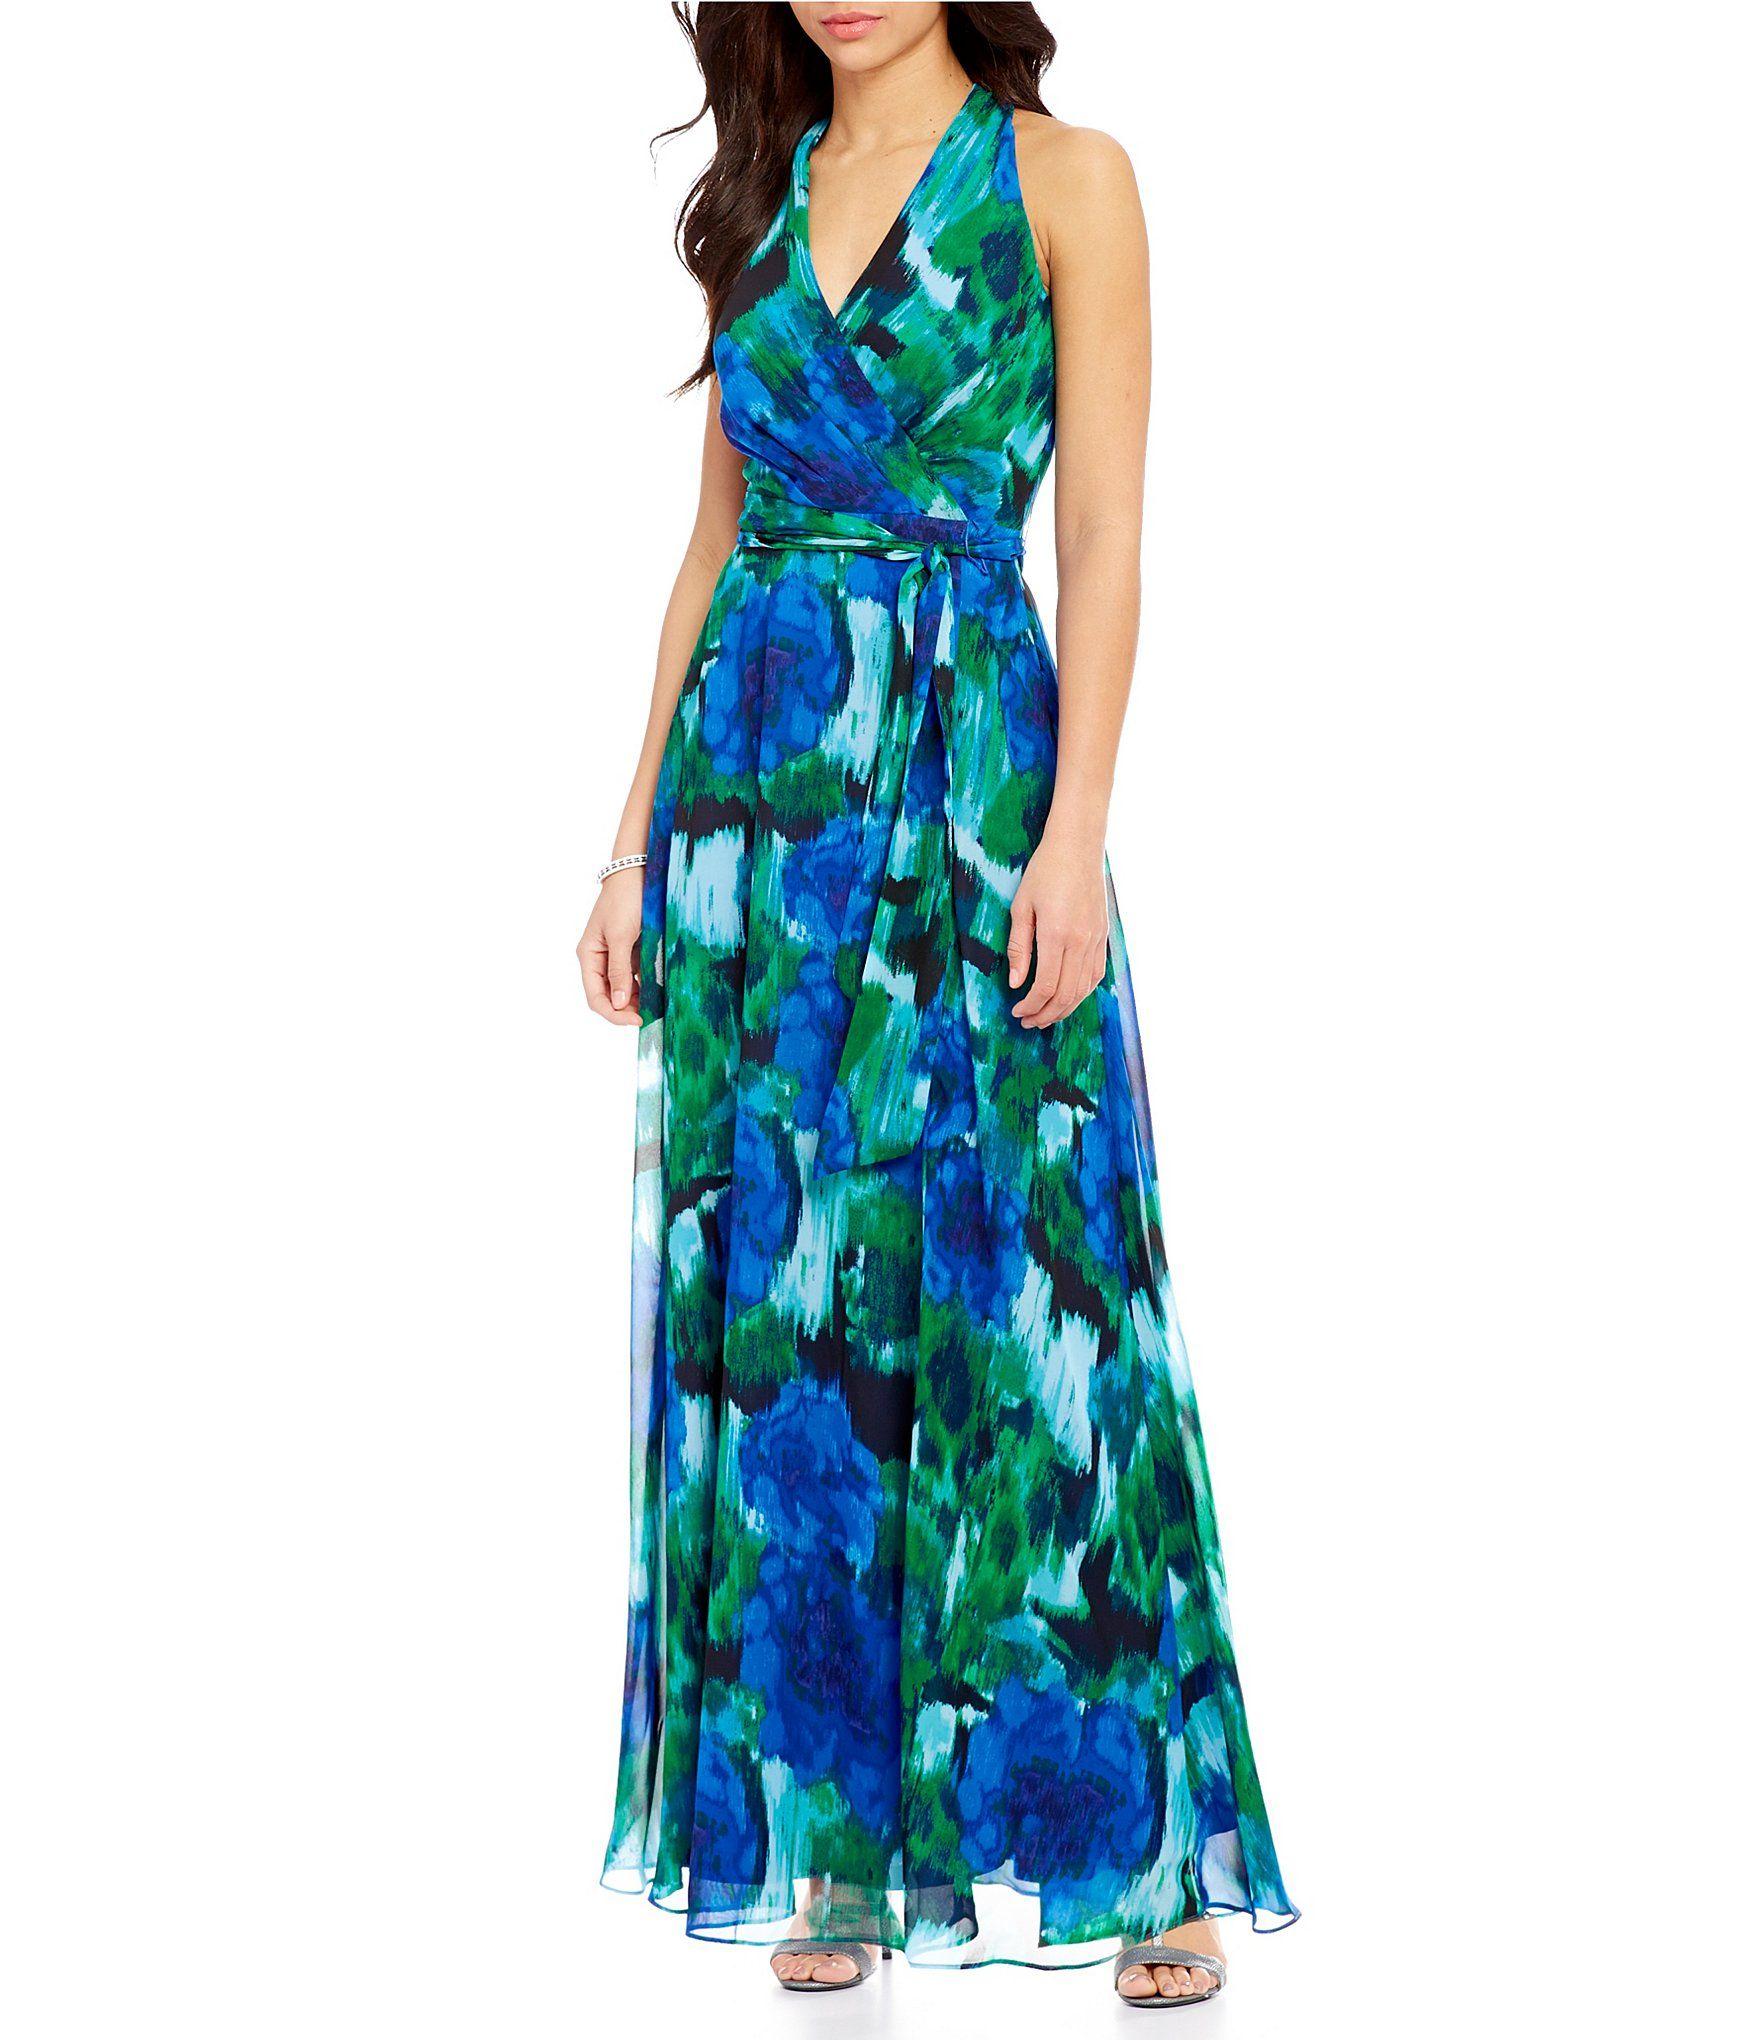 e952ebc23b37 Leslie Fay FloralPrint Chiffon Maxi Dress #Dillards   K & M Wedding ...